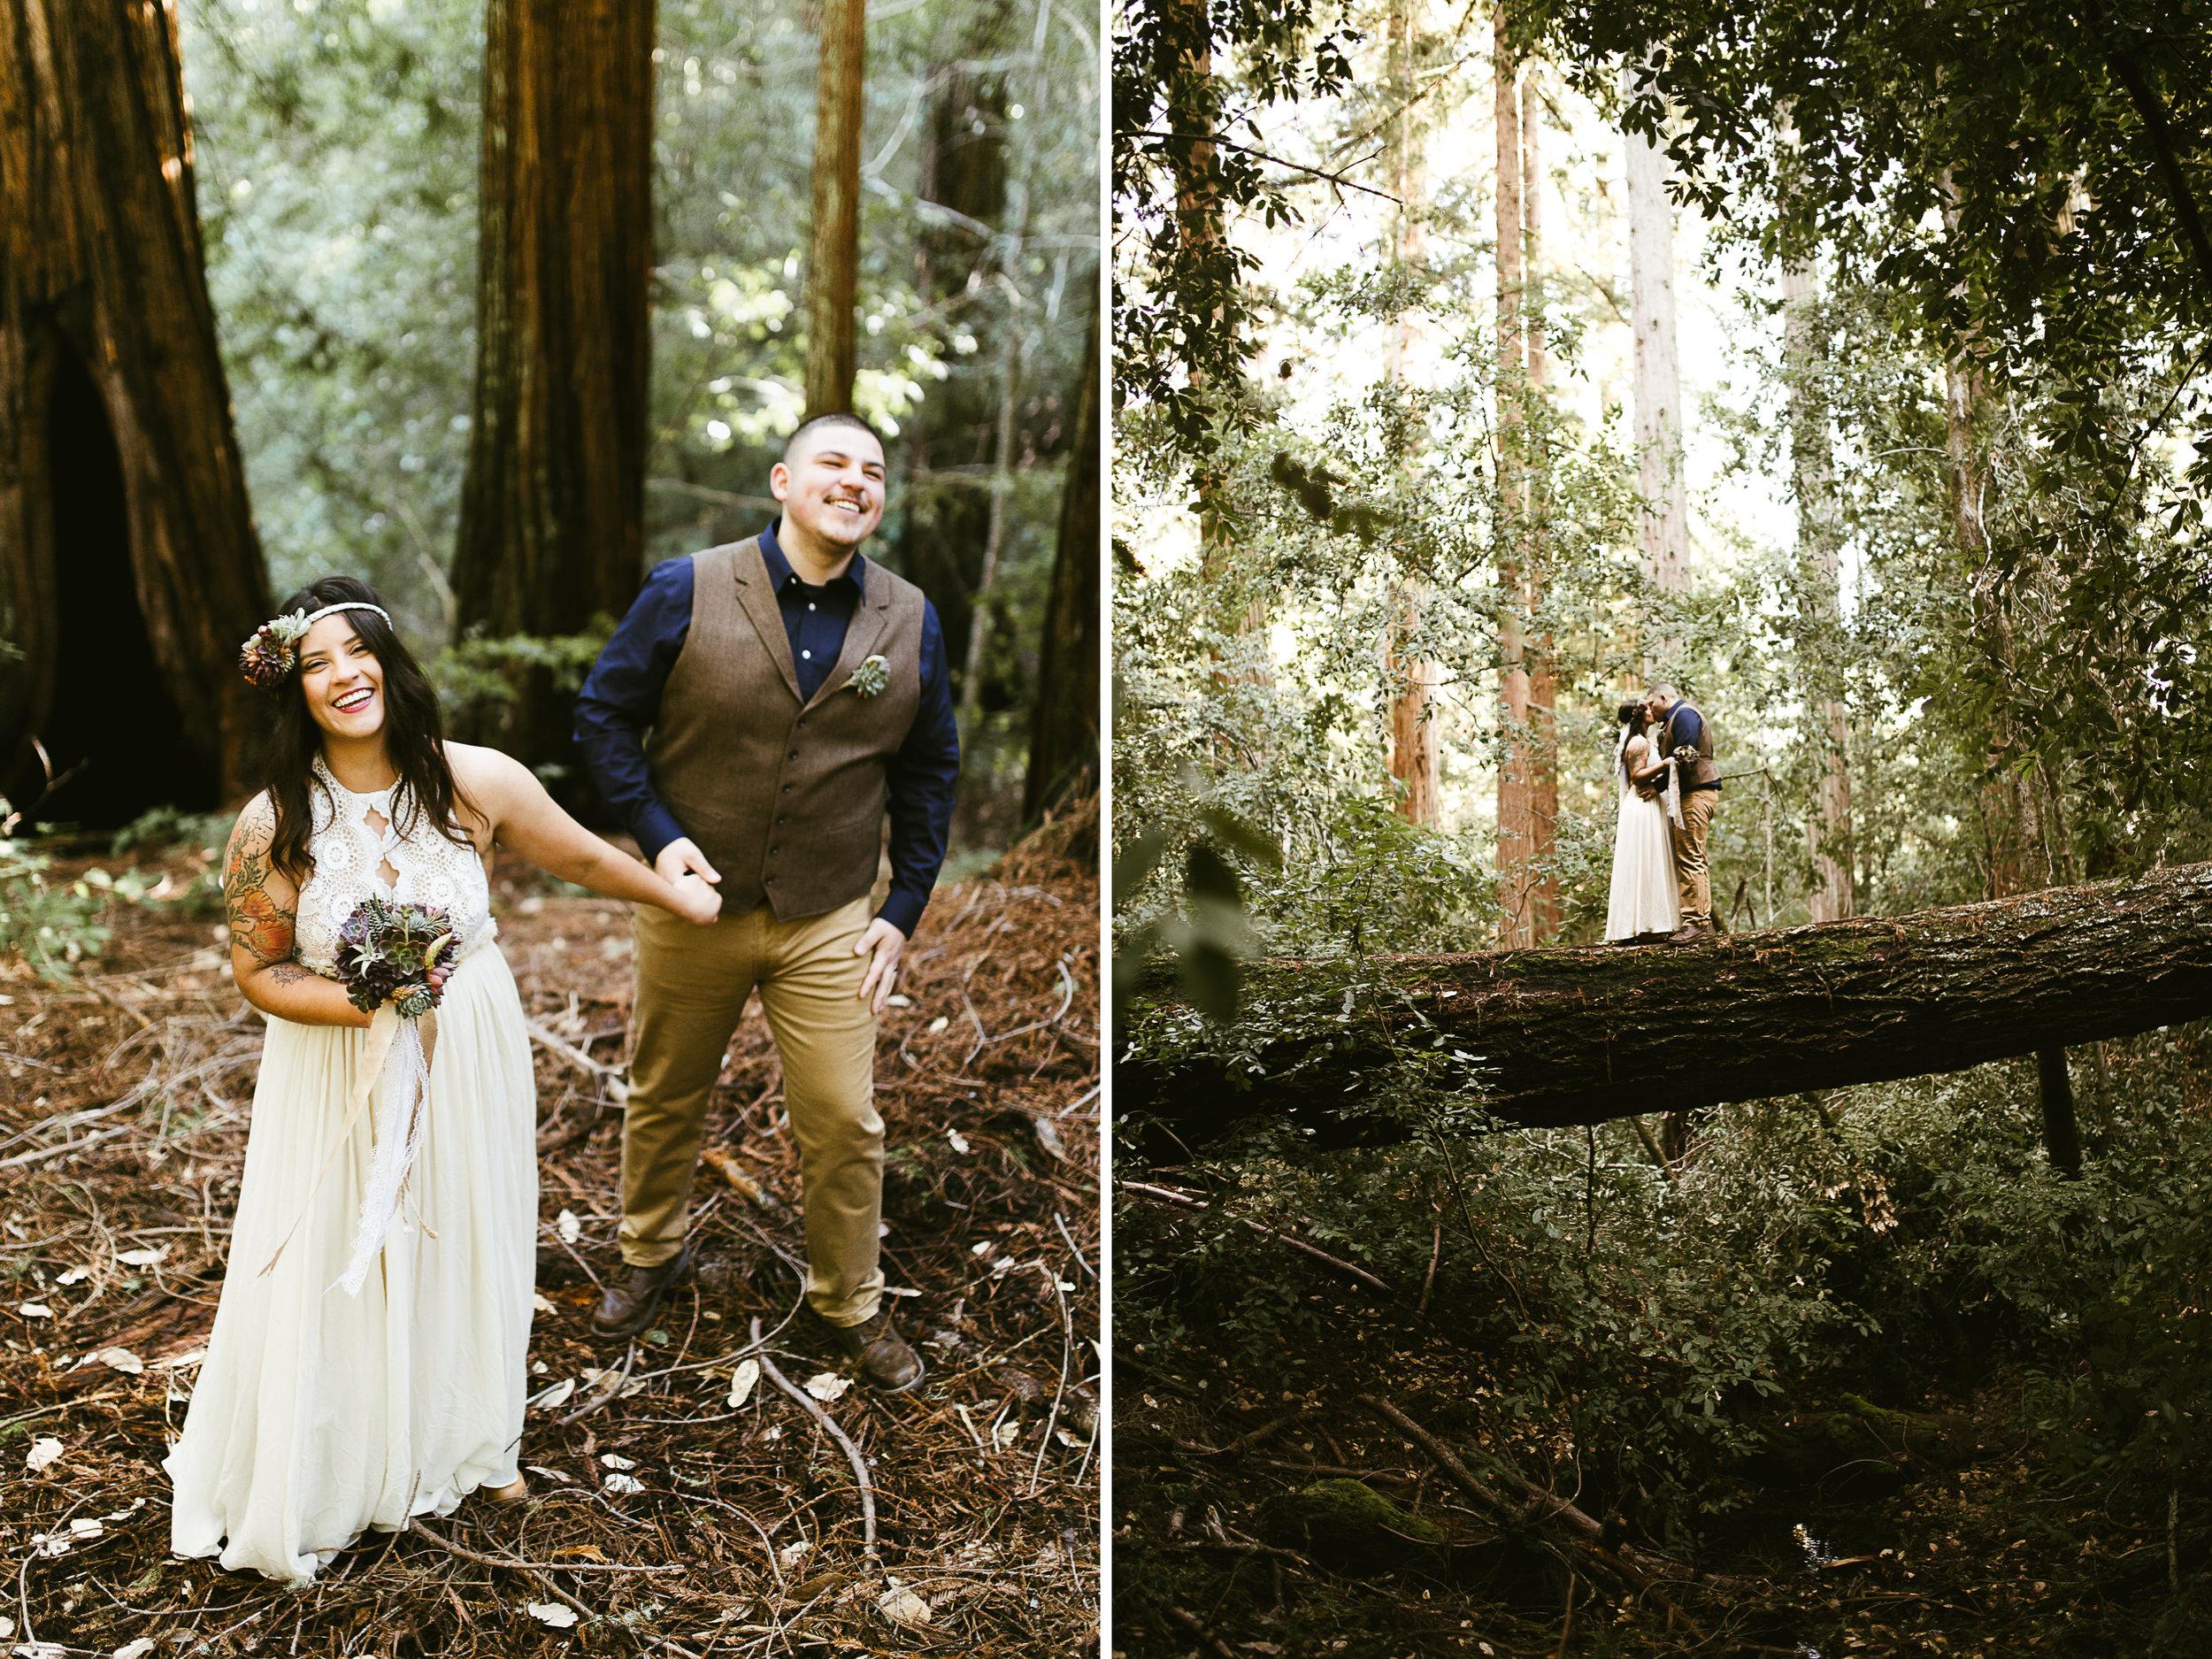 hiking elopement in california redwood forest | destination adventure wedding photographers | the hearnes adventure photography | www.thehearnes.com